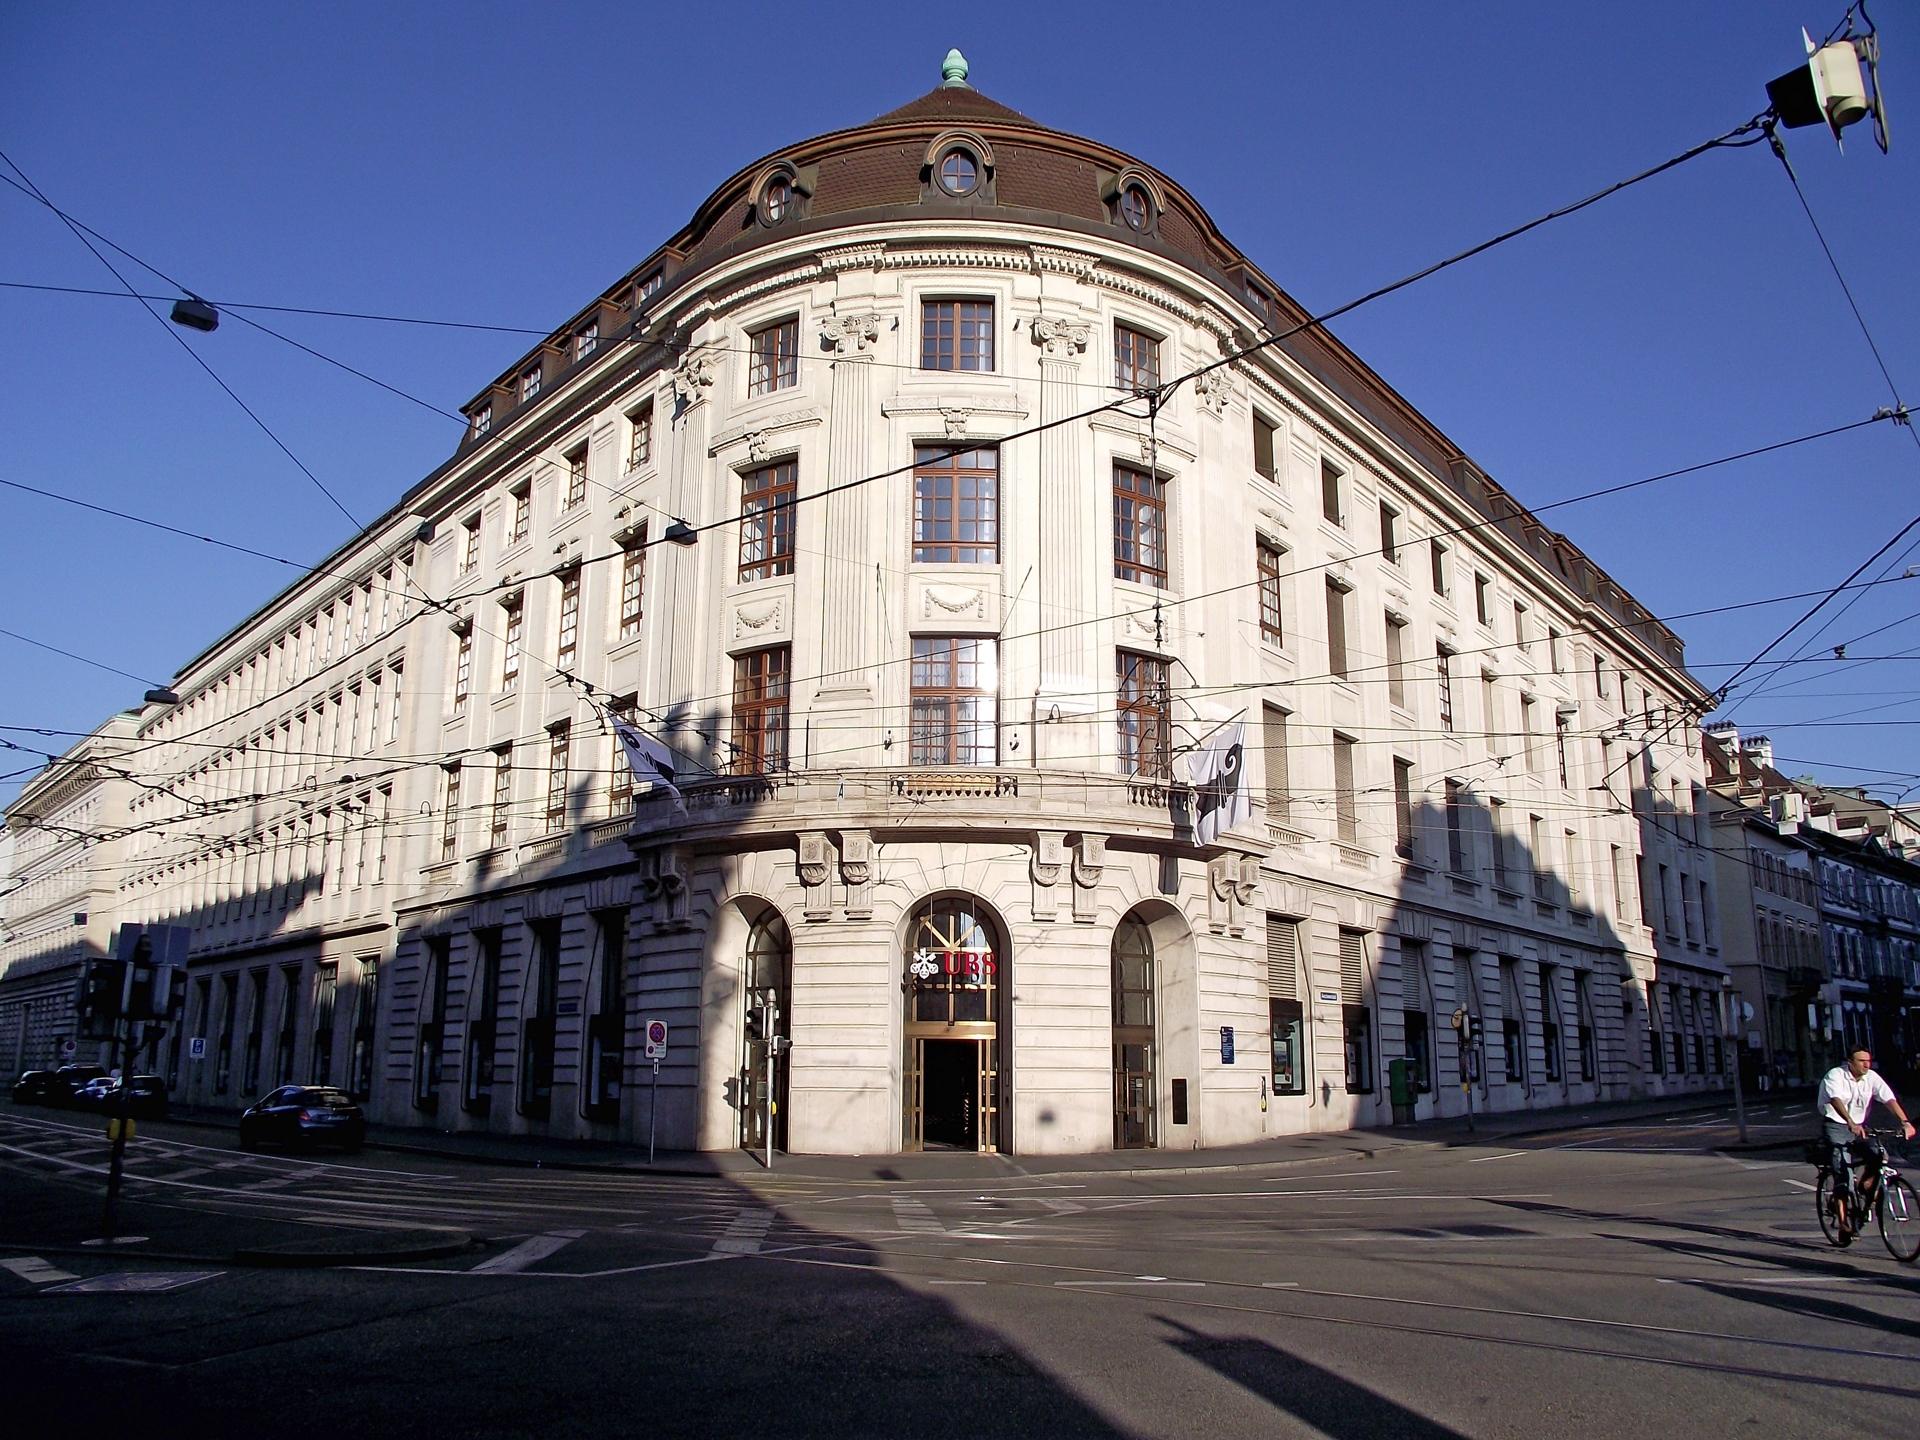 File:Bankhaus UBS AG.jpg - Wikimedia Commons